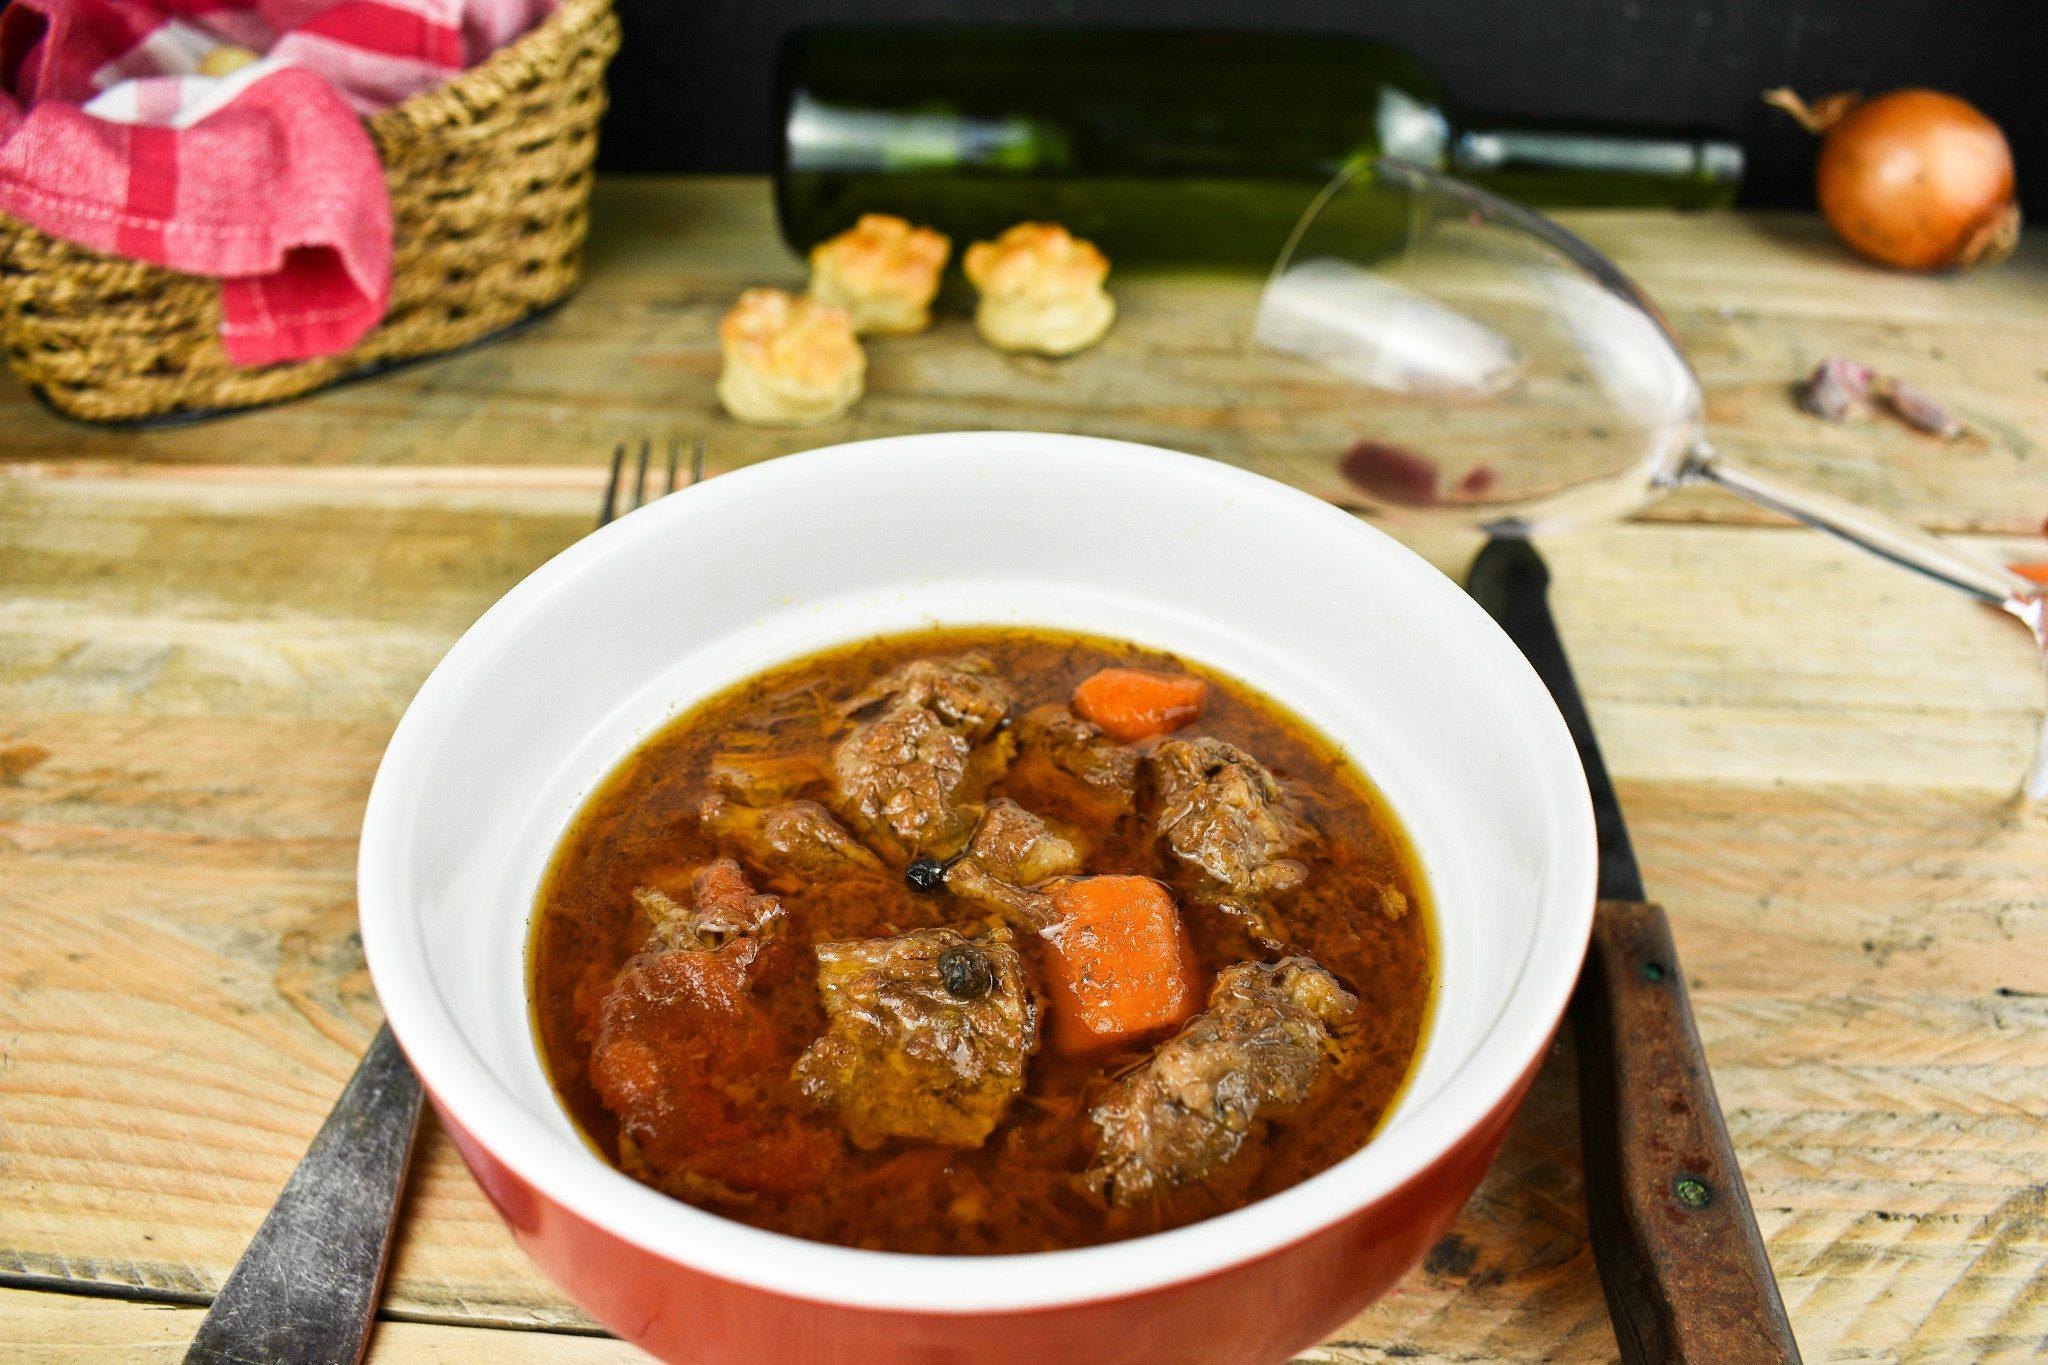 Best-beef-stew-recipe-Beef-goulash-2-SunCakeMom